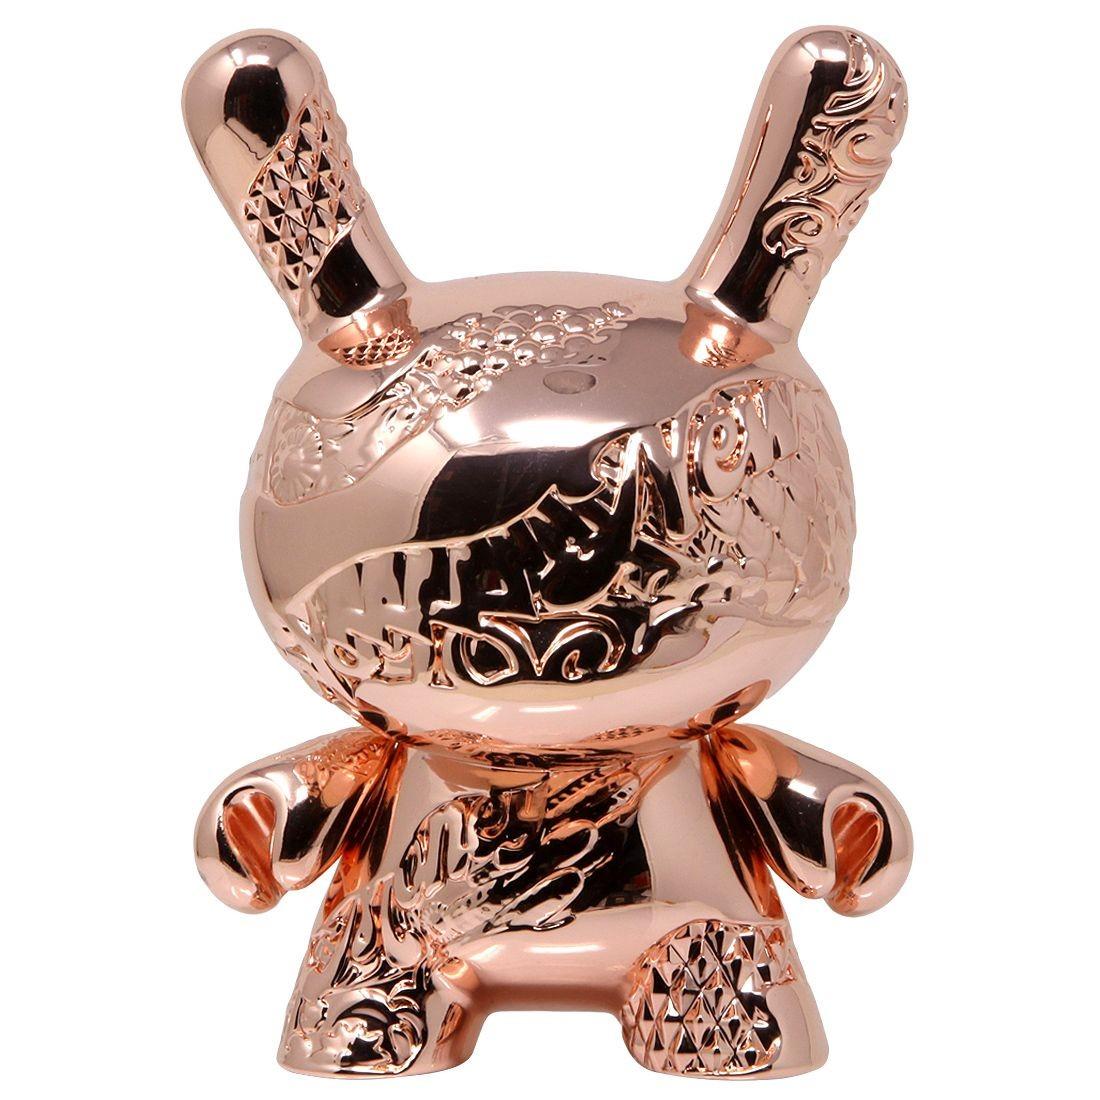 Kidrobot x Tristan Eaton Rose Gold New Money 5 Inch Metal Dunny Figure (pink / rose gold)